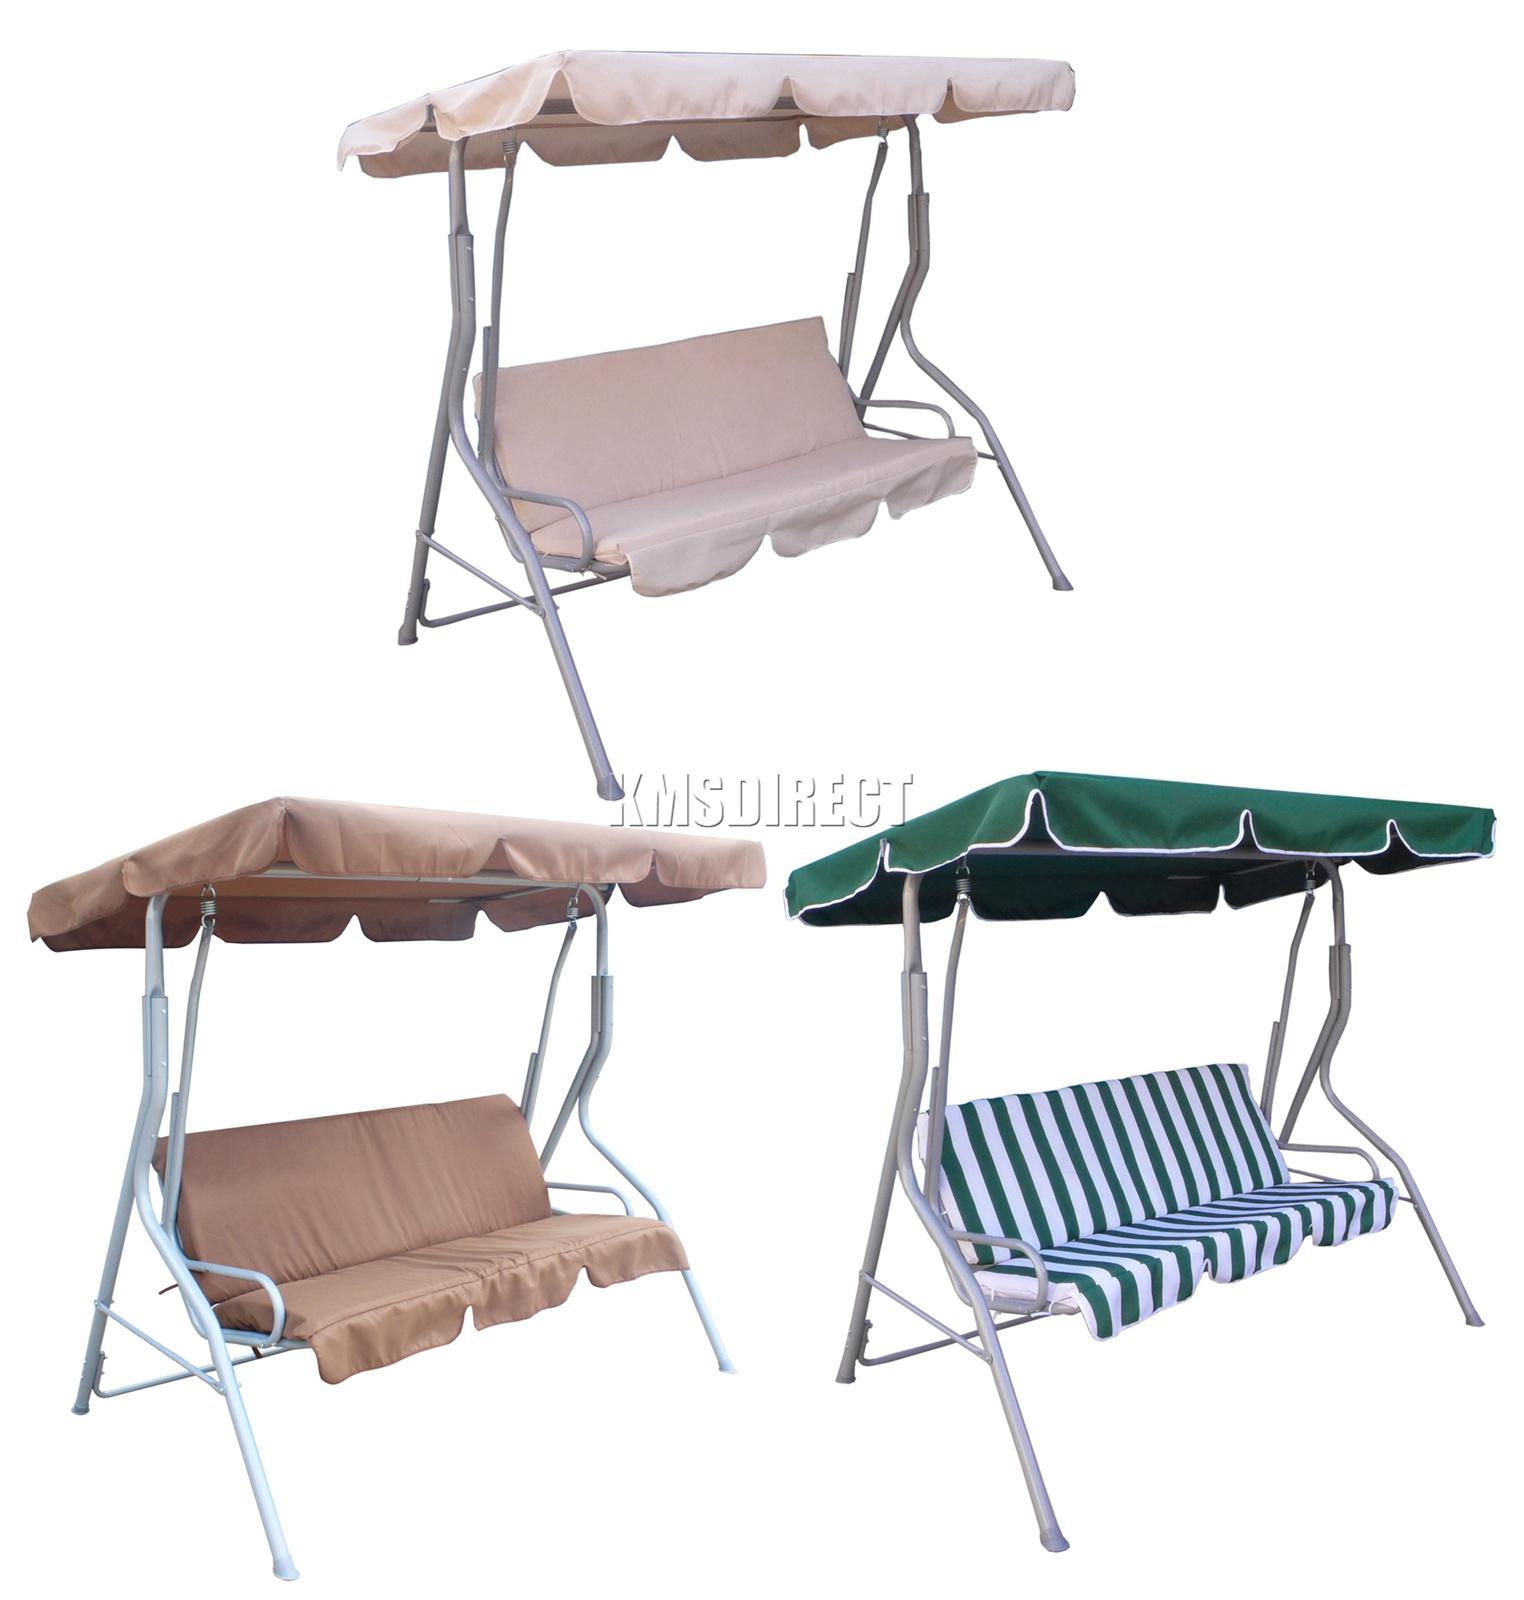 Westwood Garden Metal Swing Hammock 3 Seater Chair Bench